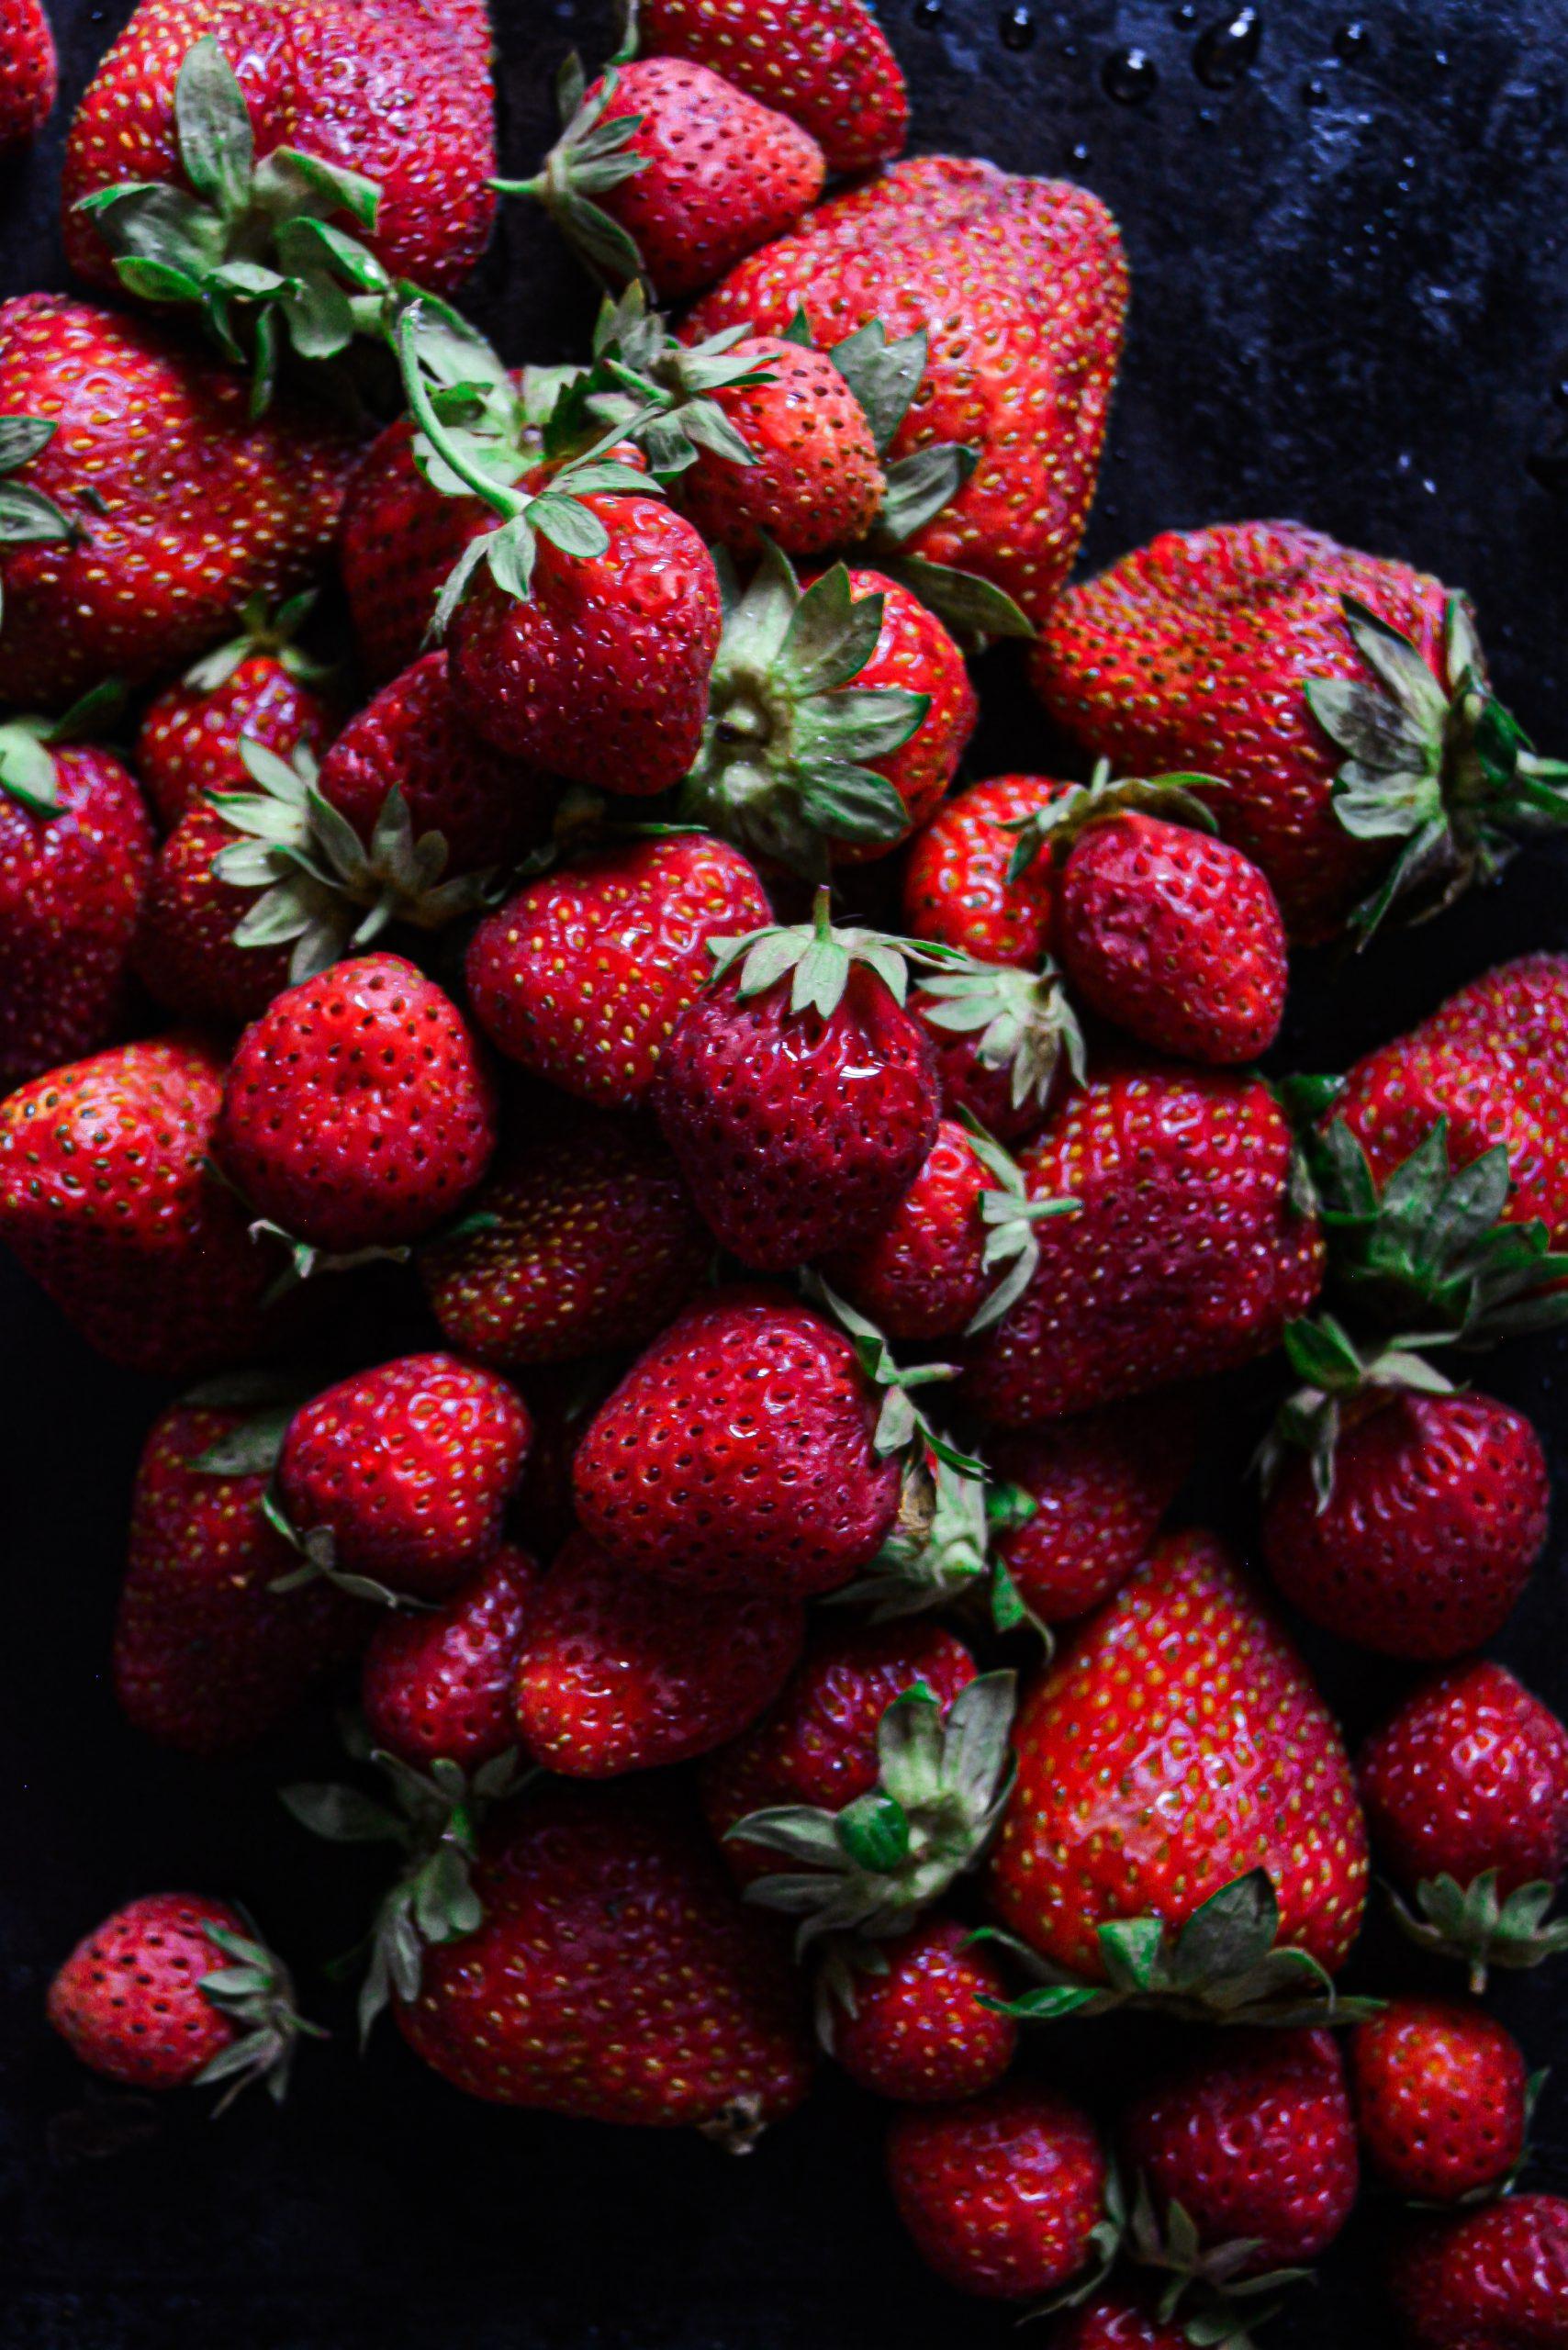 Croustillant Crumble Vegan Fraises, Rhubarbe / Vegan Strawberry, Rhubarb Crisp